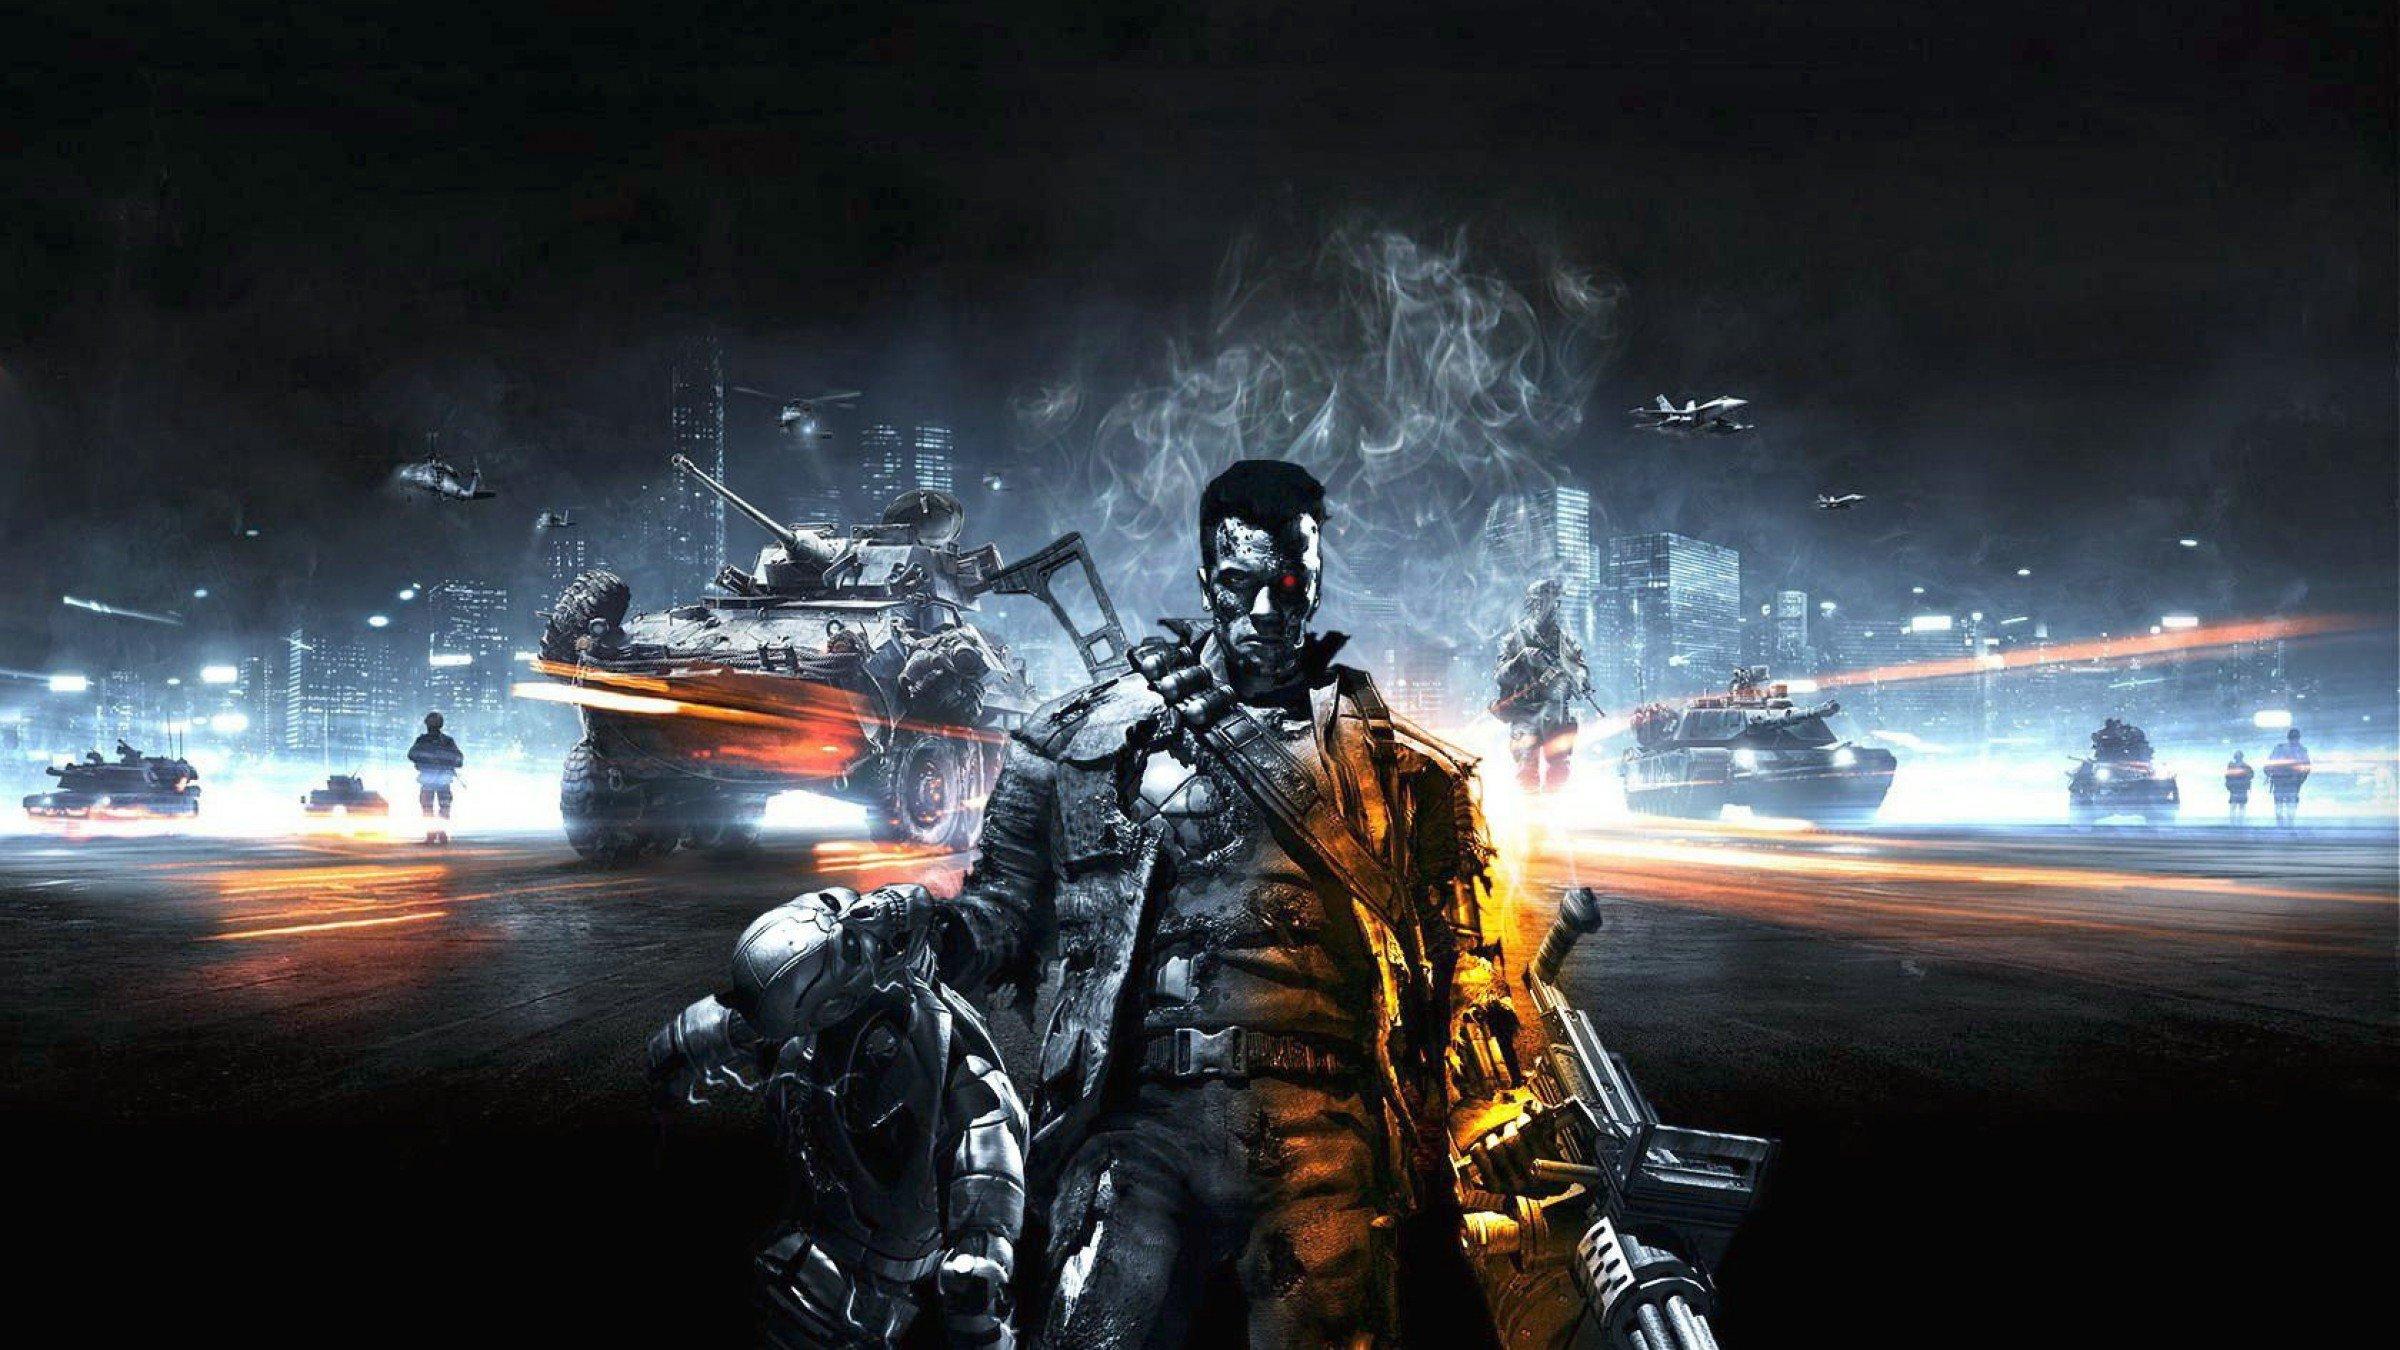 Hd wallpaper bahubali 2 - Terminator Genisys 2015 Terminator 5 Trailer Amp Film